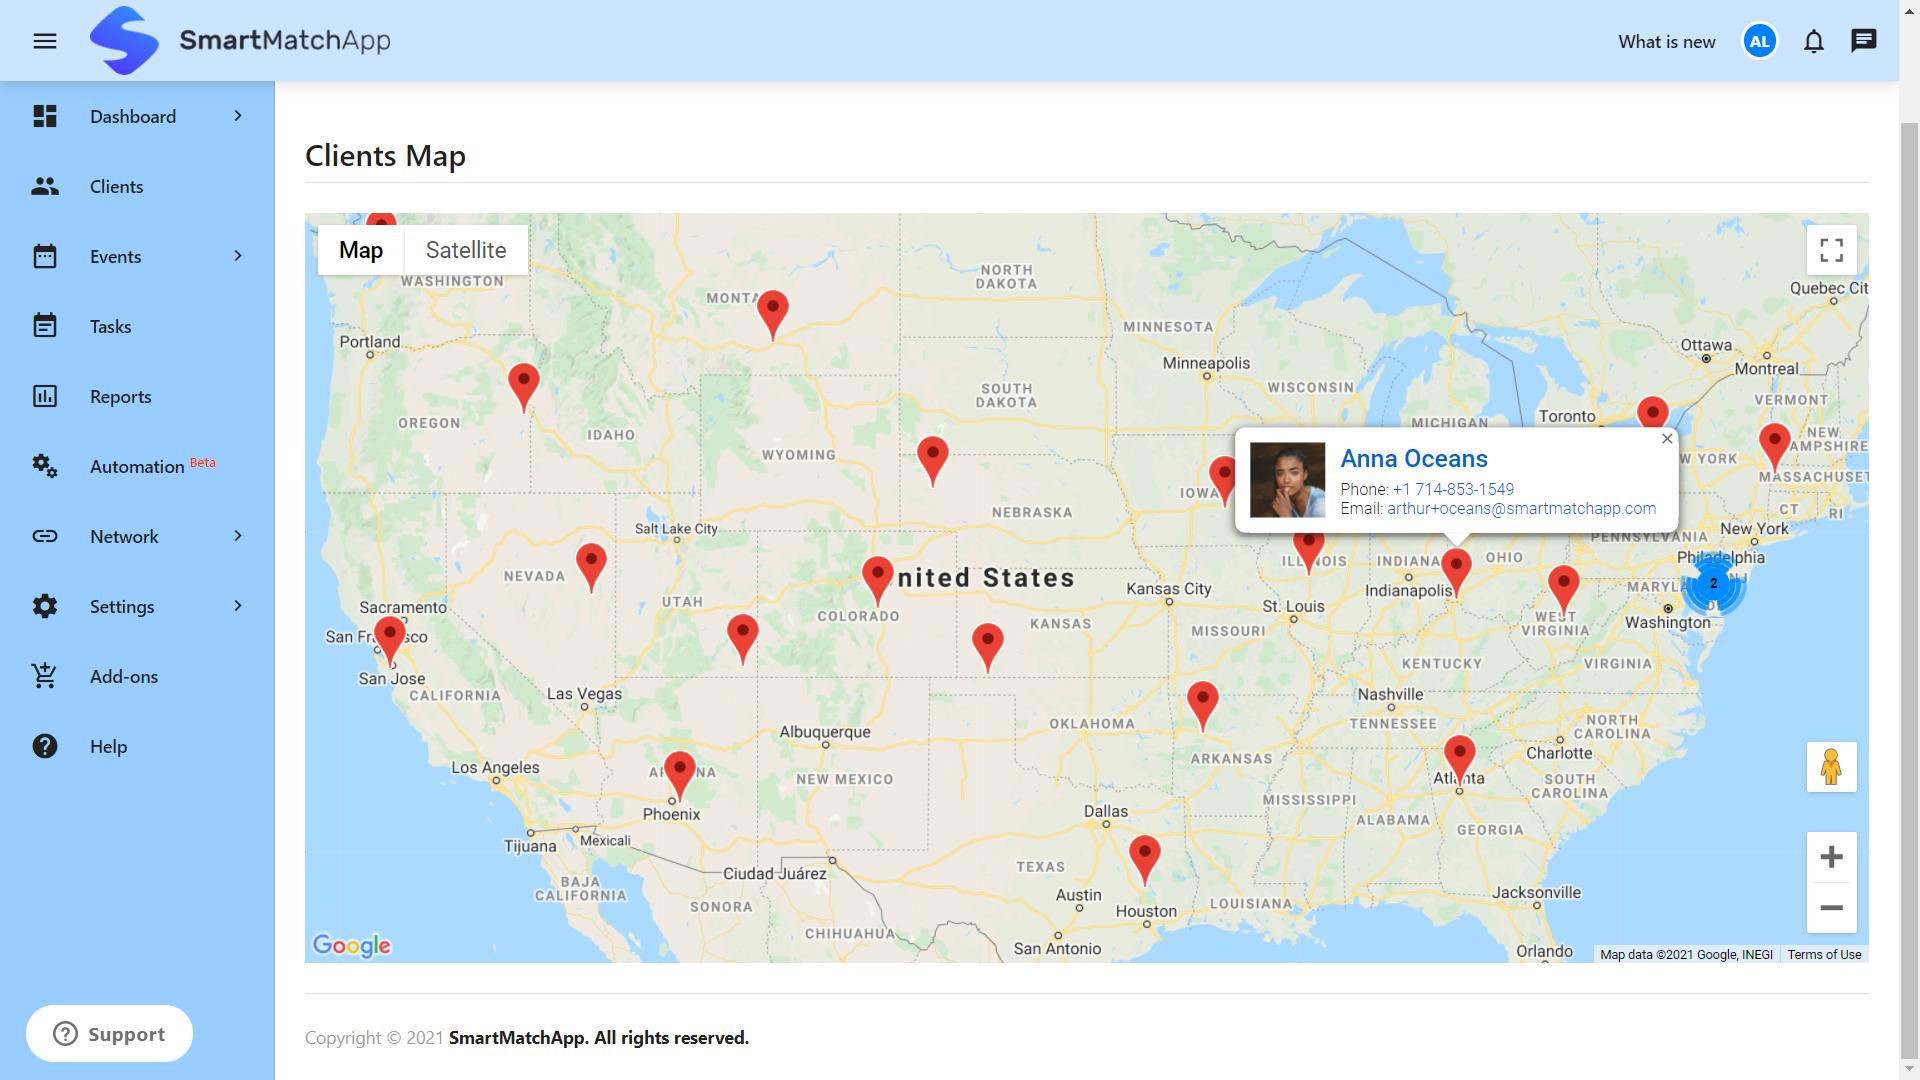 SmartMatchApp Matchmaking Client Map